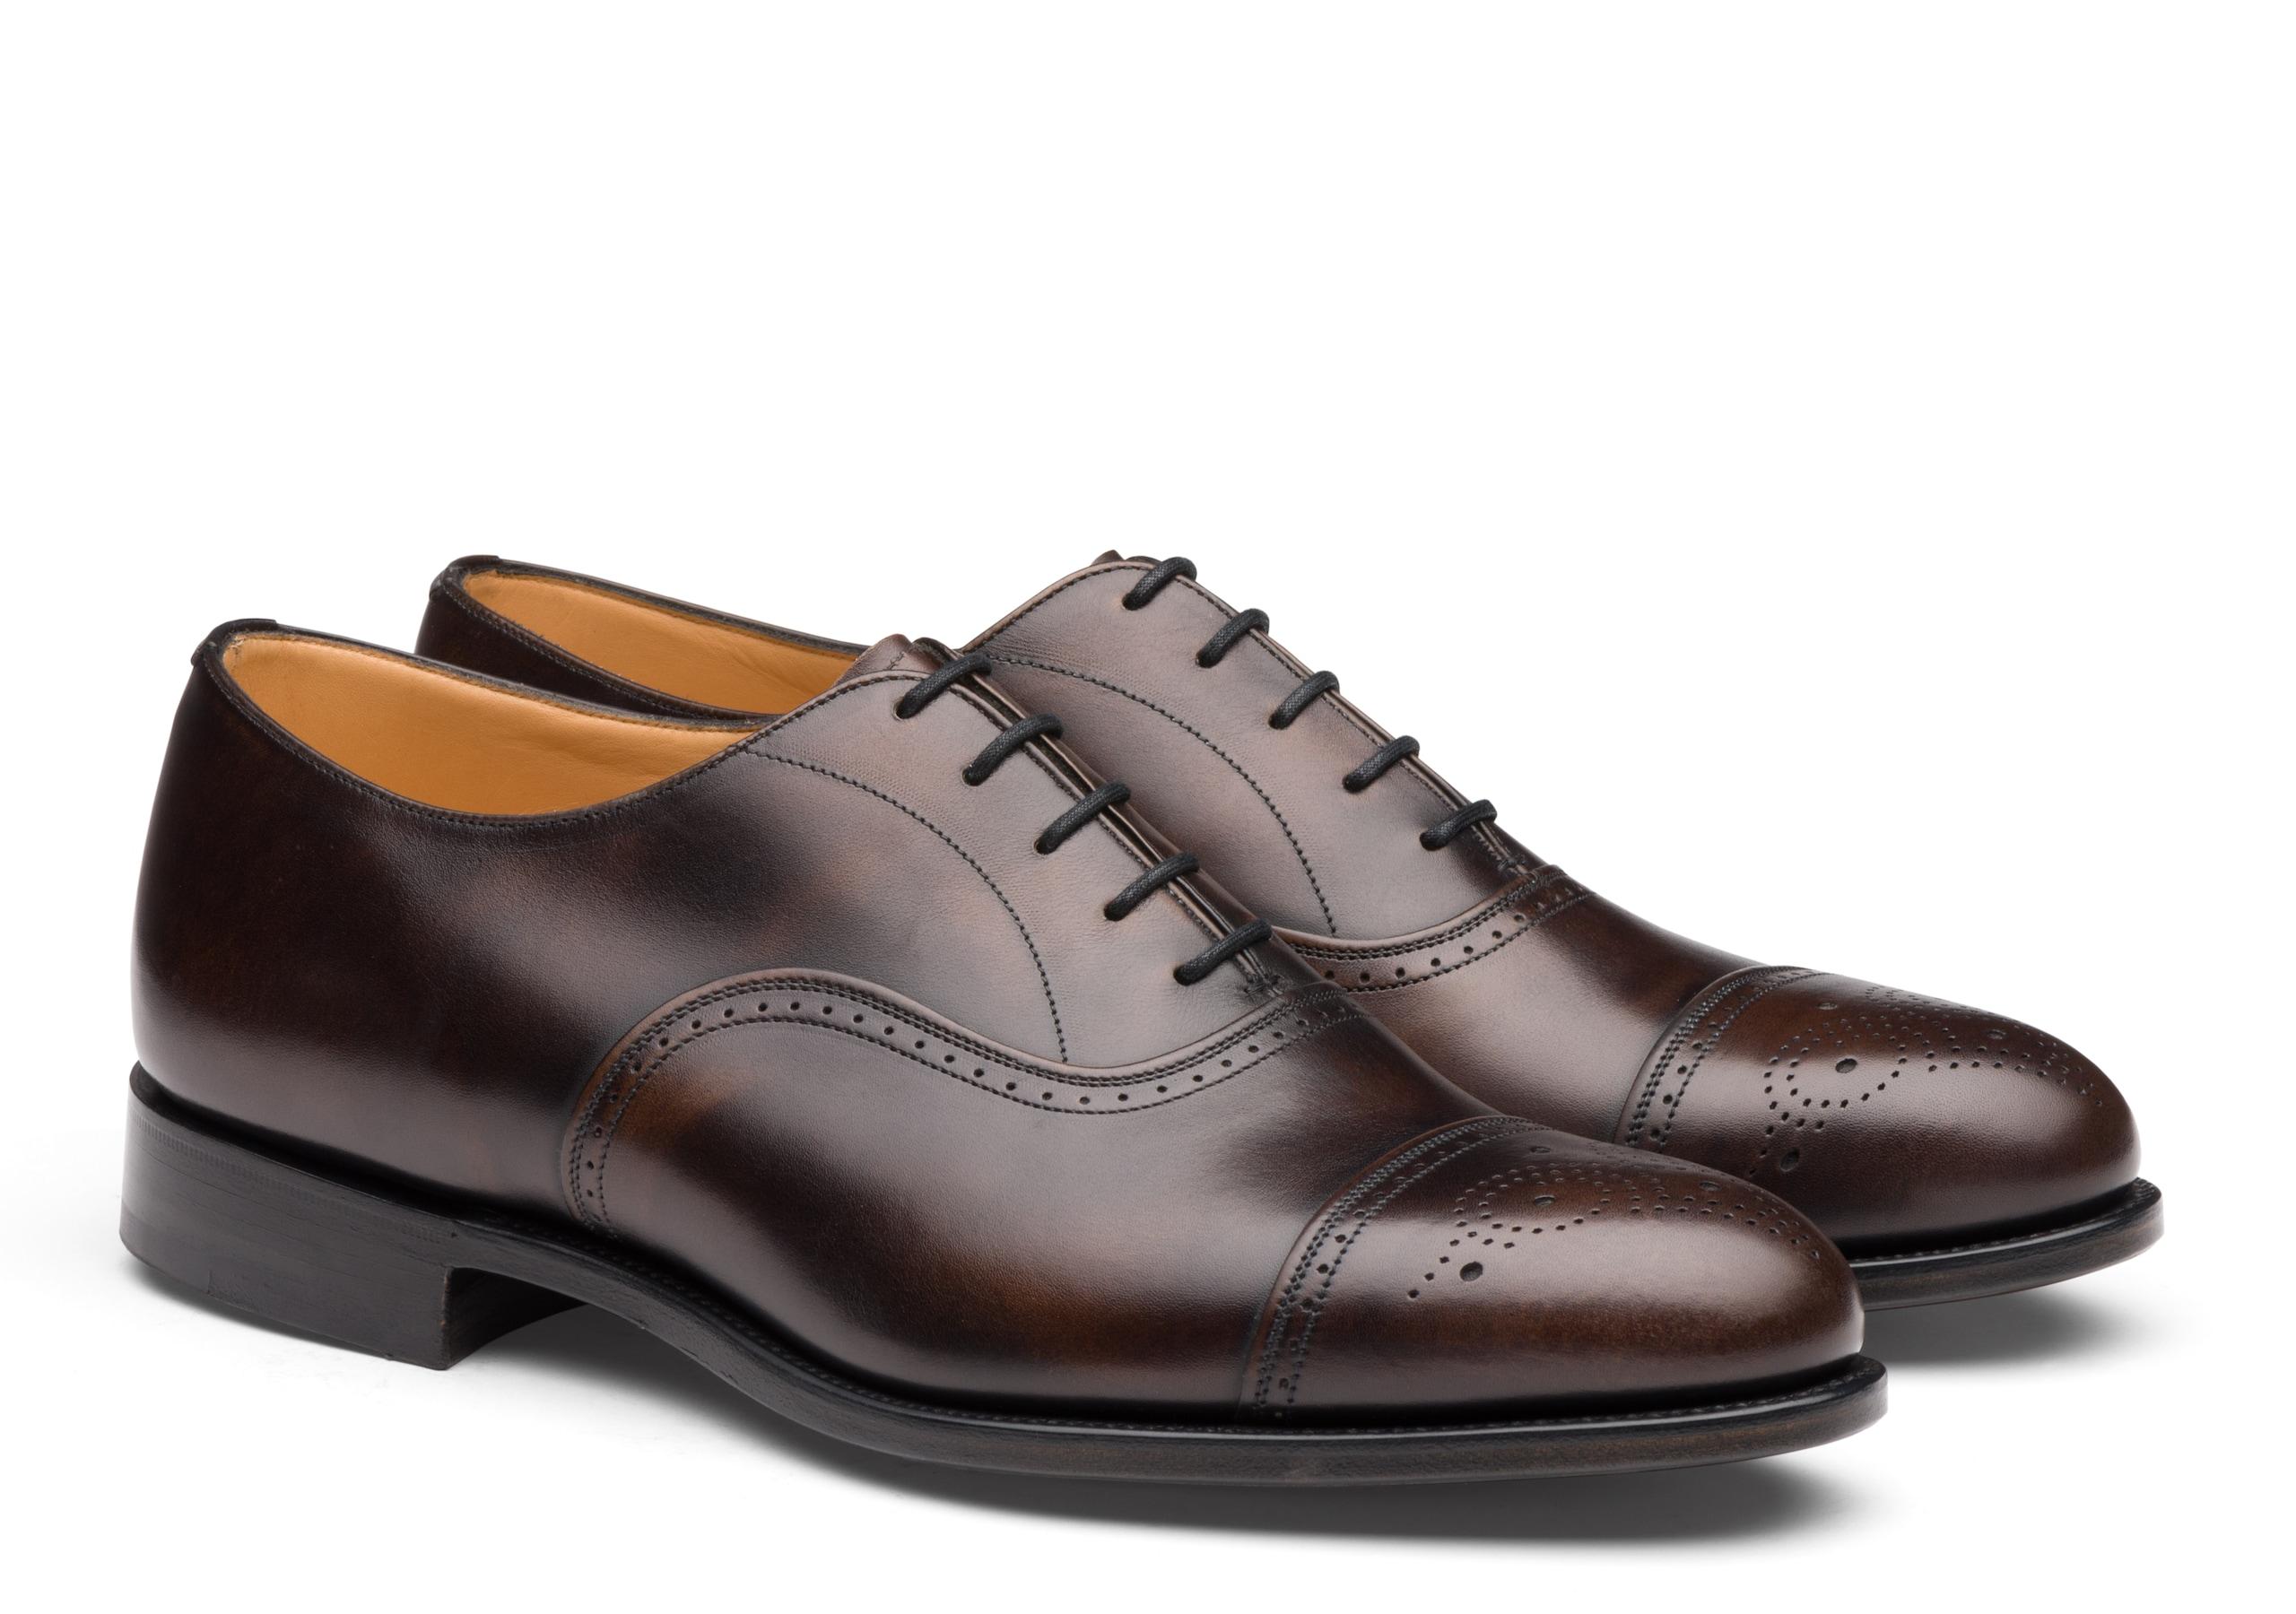 Duke Church's Royal Calf Leather Brogue Brown